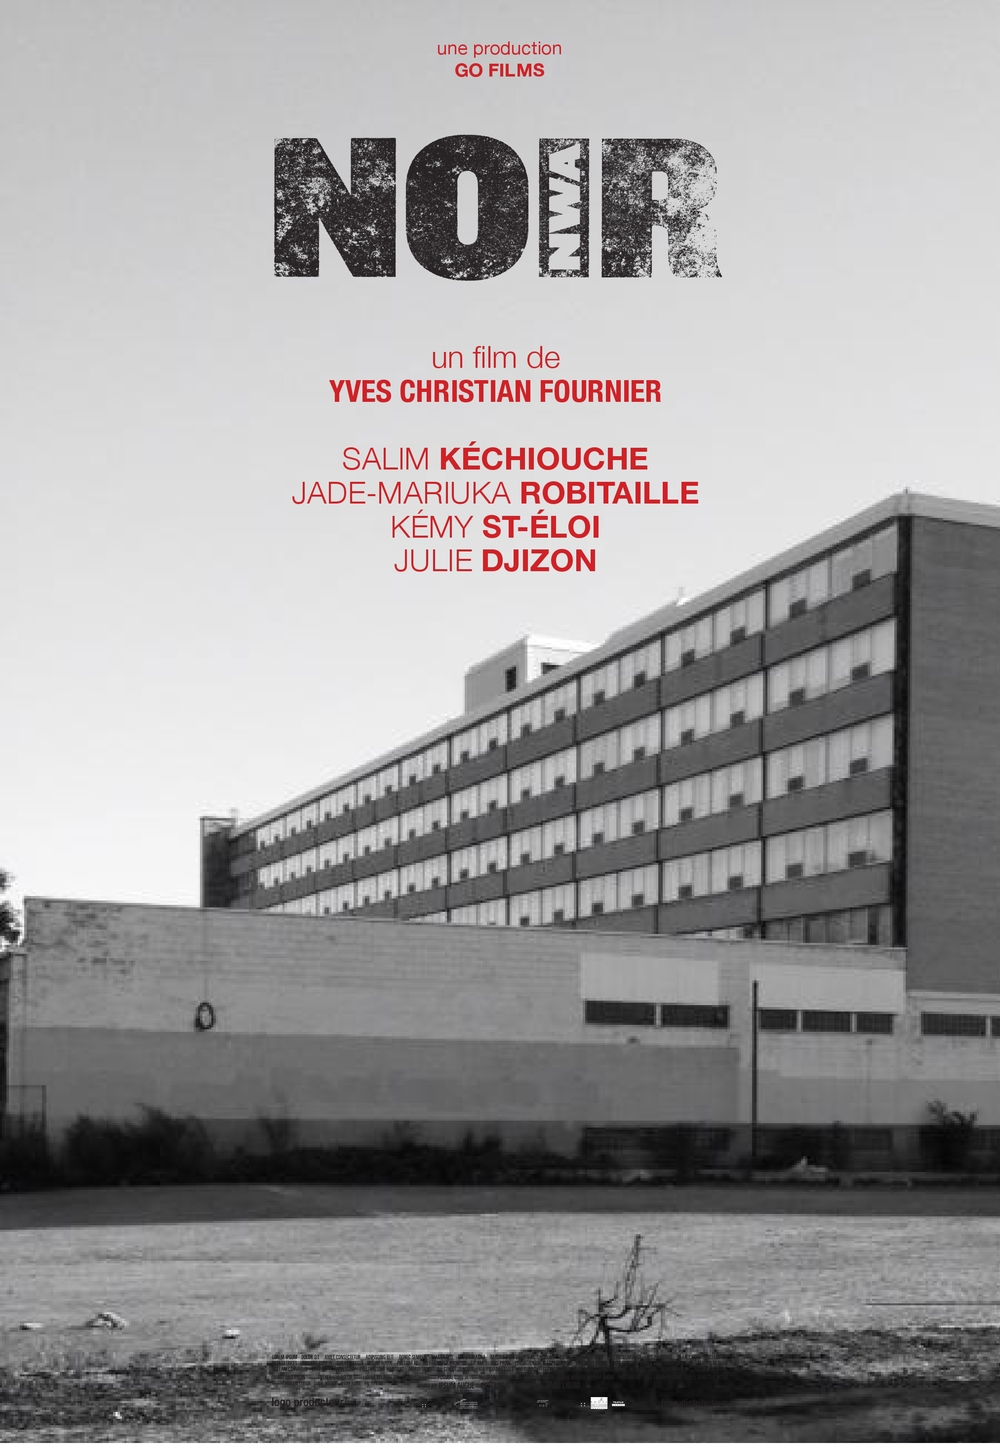 NOIR-Poster-RENZO-13oct-1_00029.jpg